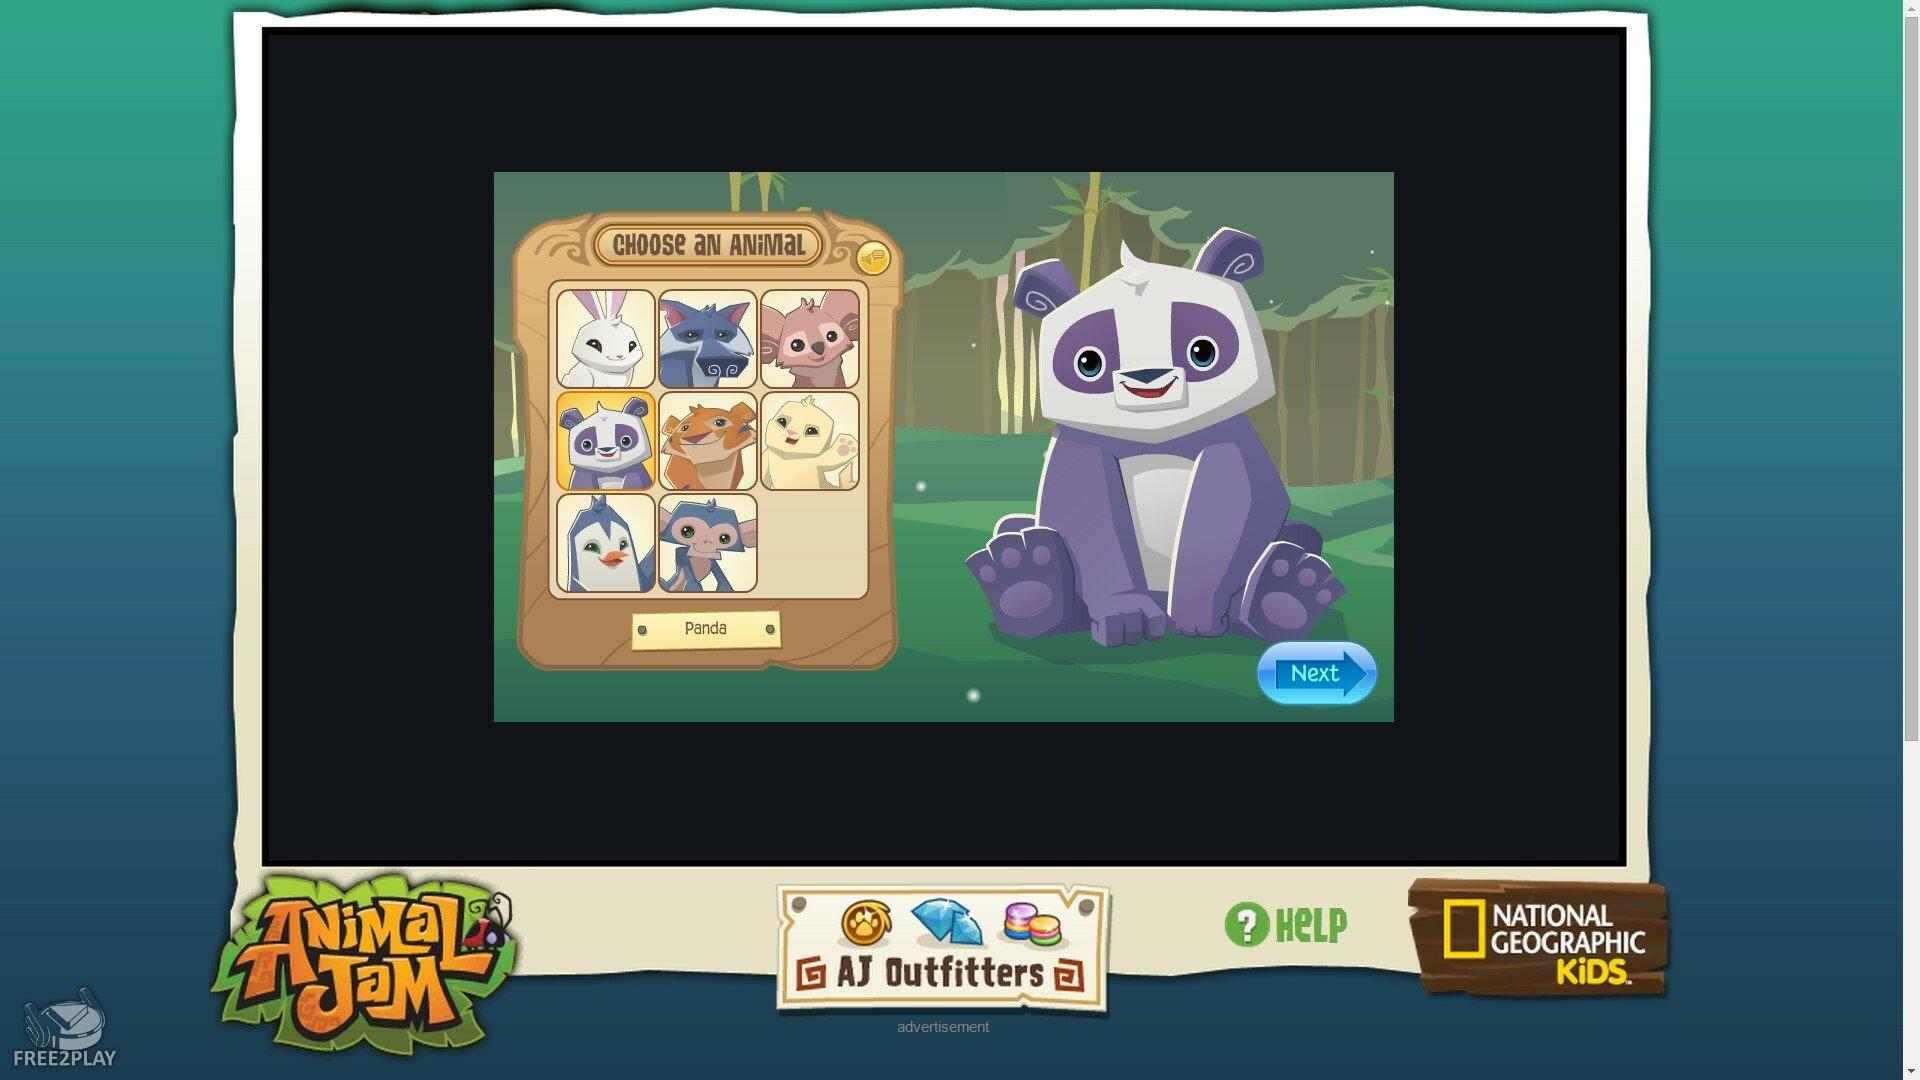 animal jam games for free